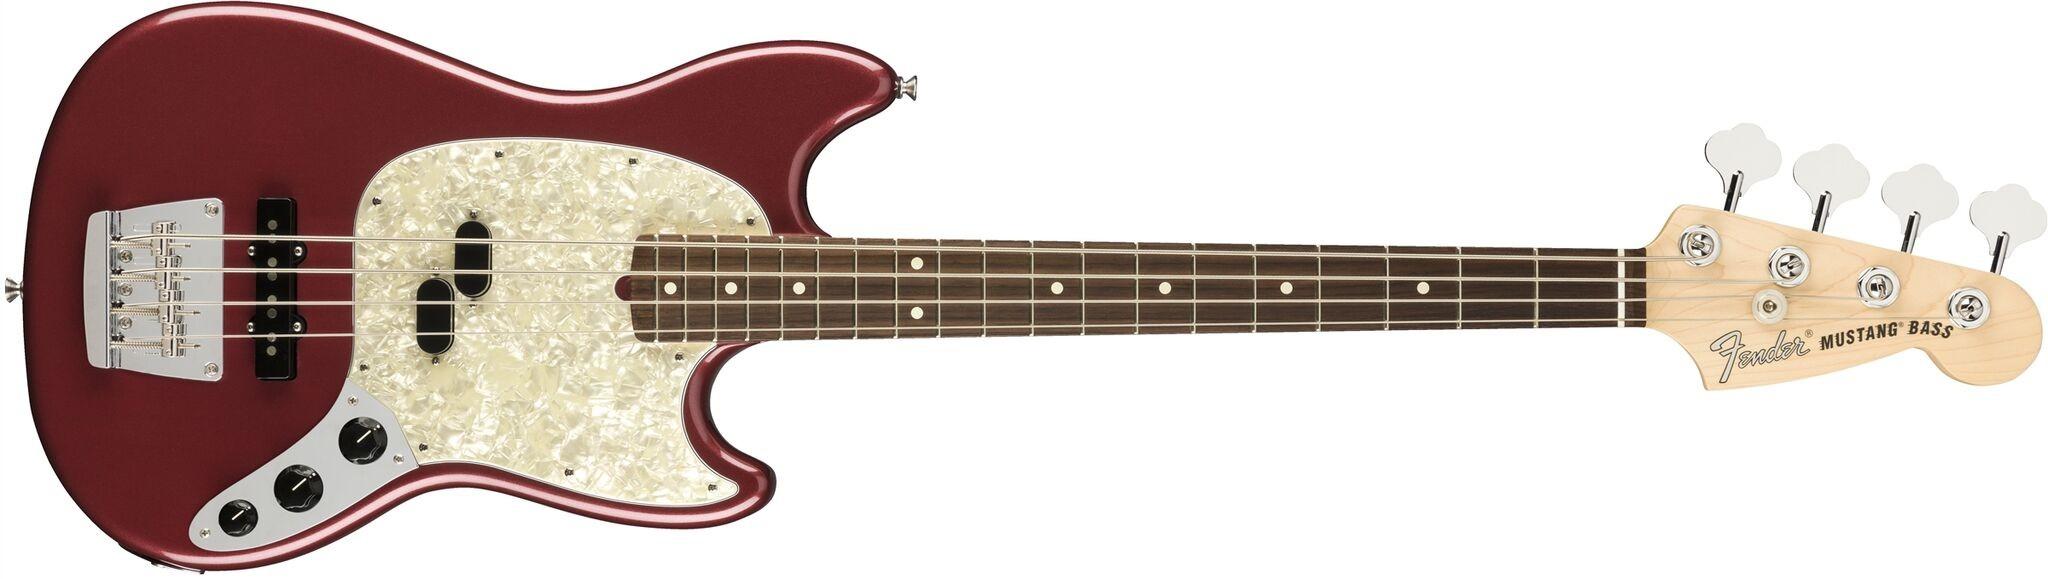 Fender American Performer Series Mustang Bass